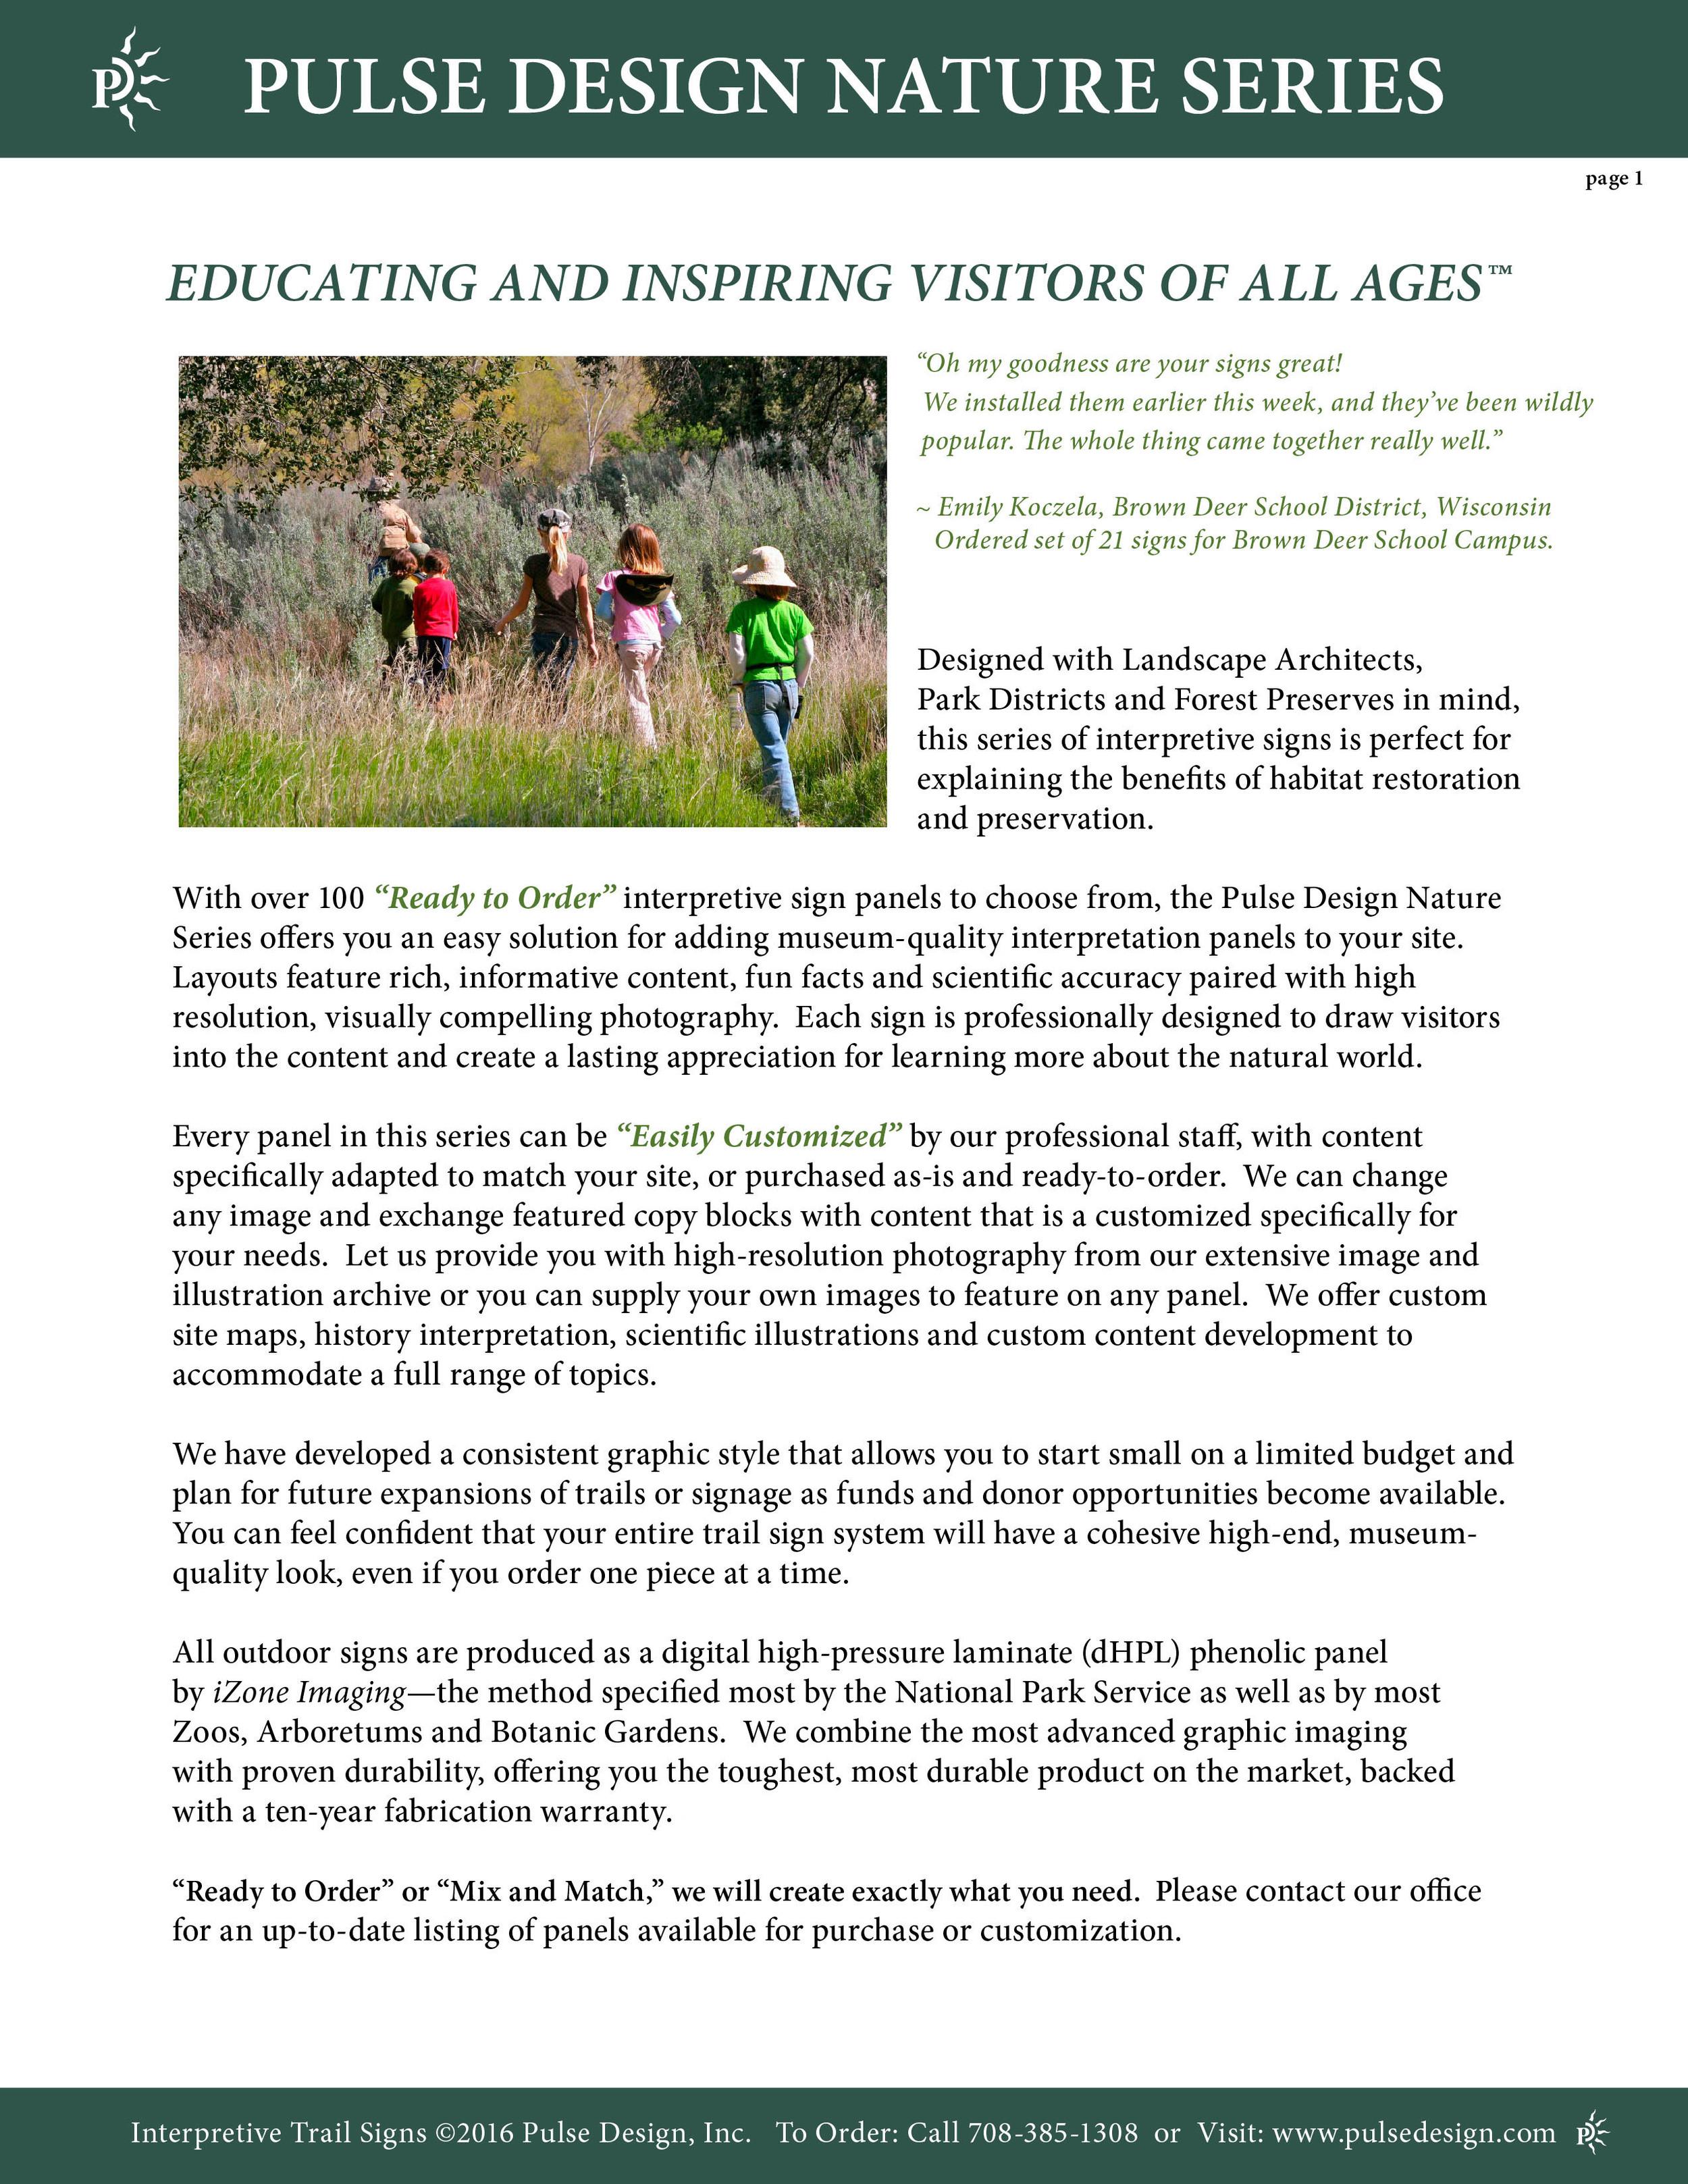 Interpretive Nature Trail Sign Catalog 2